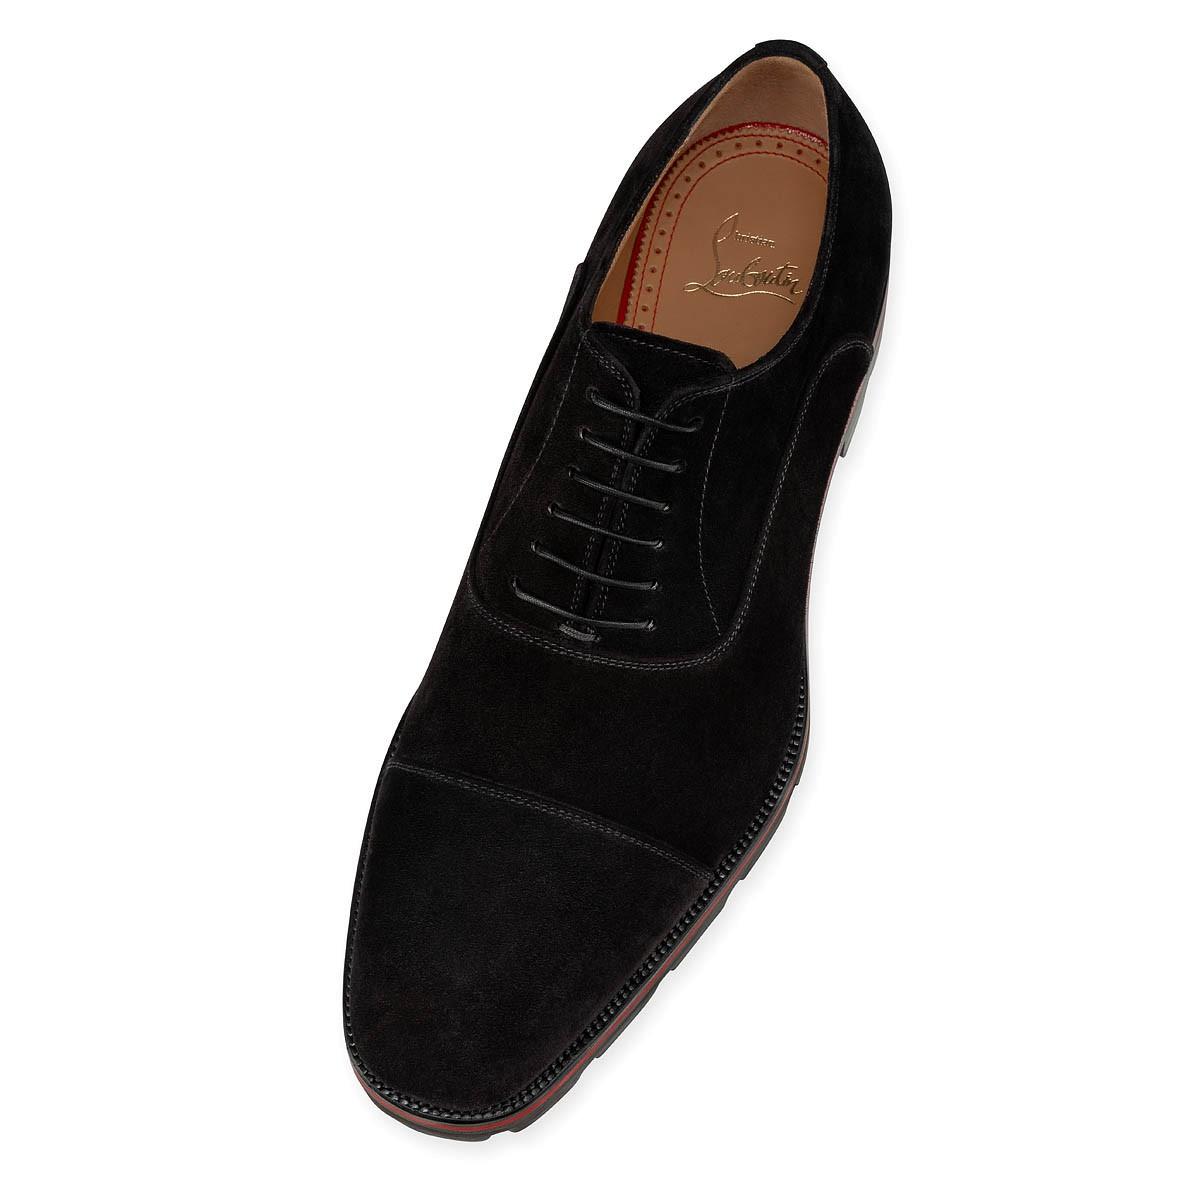 Shoes - Hubertus Flat - Christian Louboutin